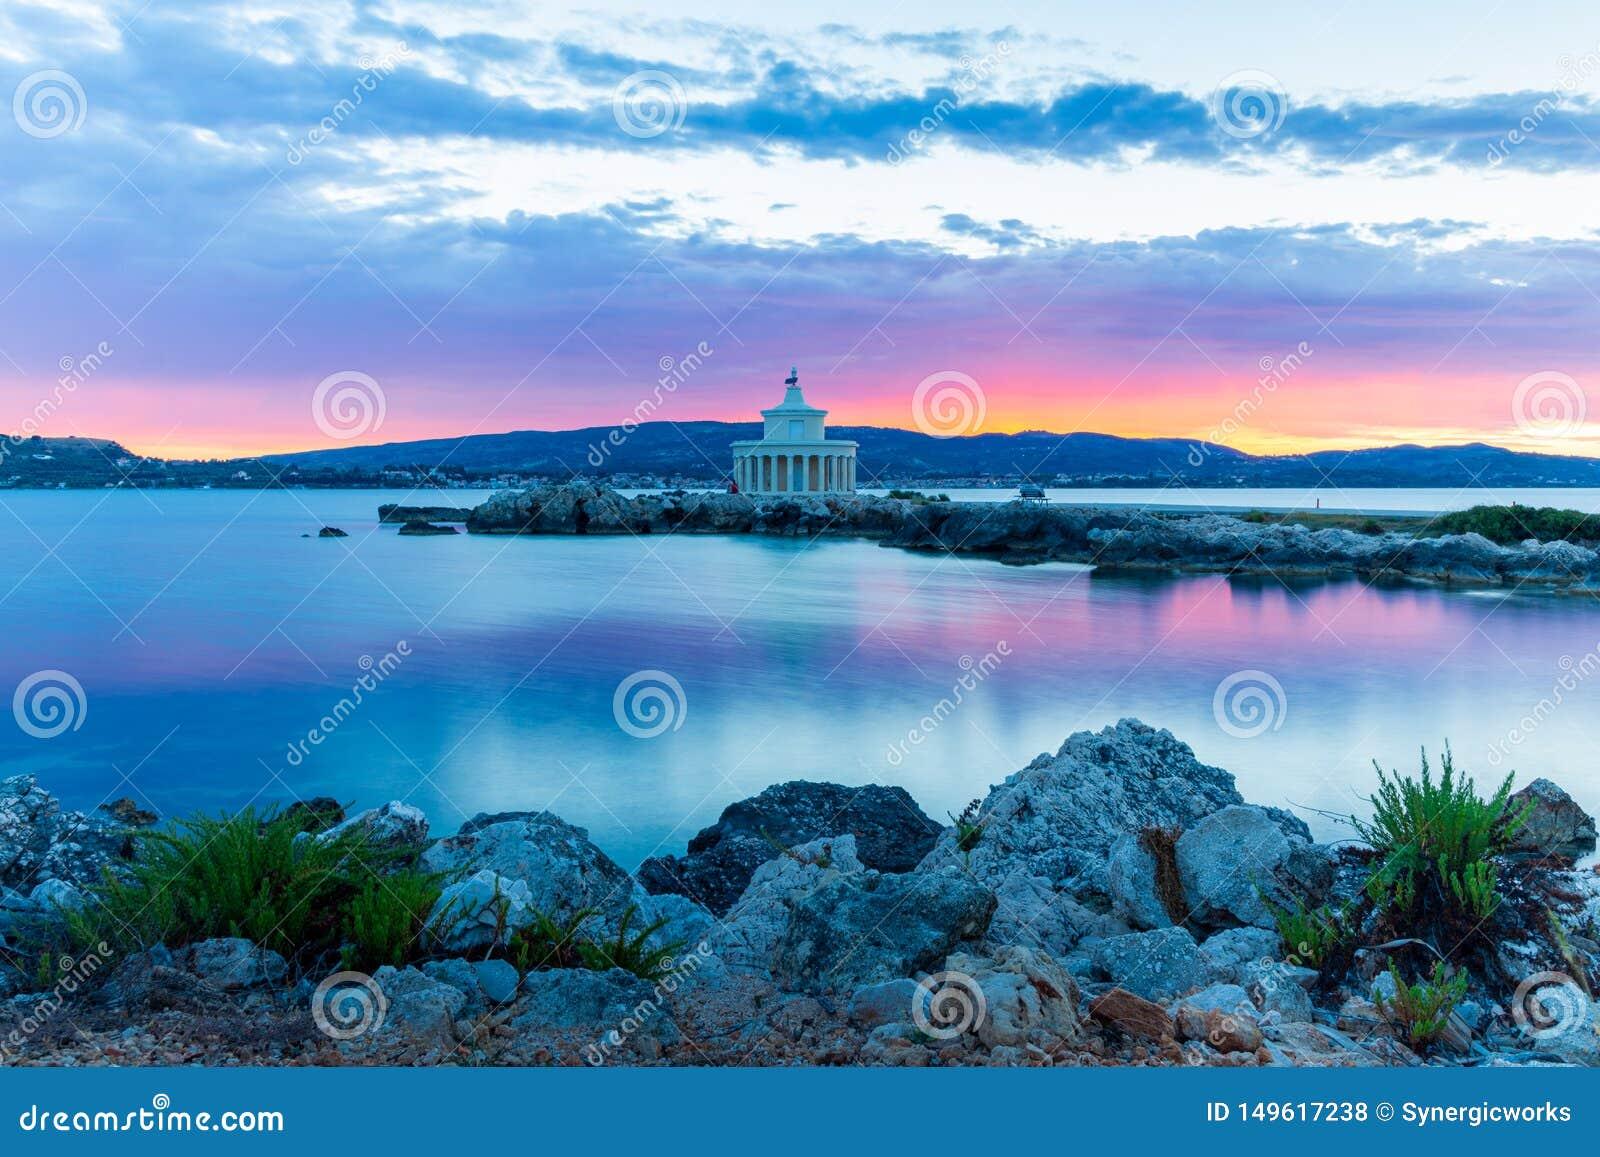 Sunrise over Lighthouse of Saint Theodoroi, Kefalonia, Greece